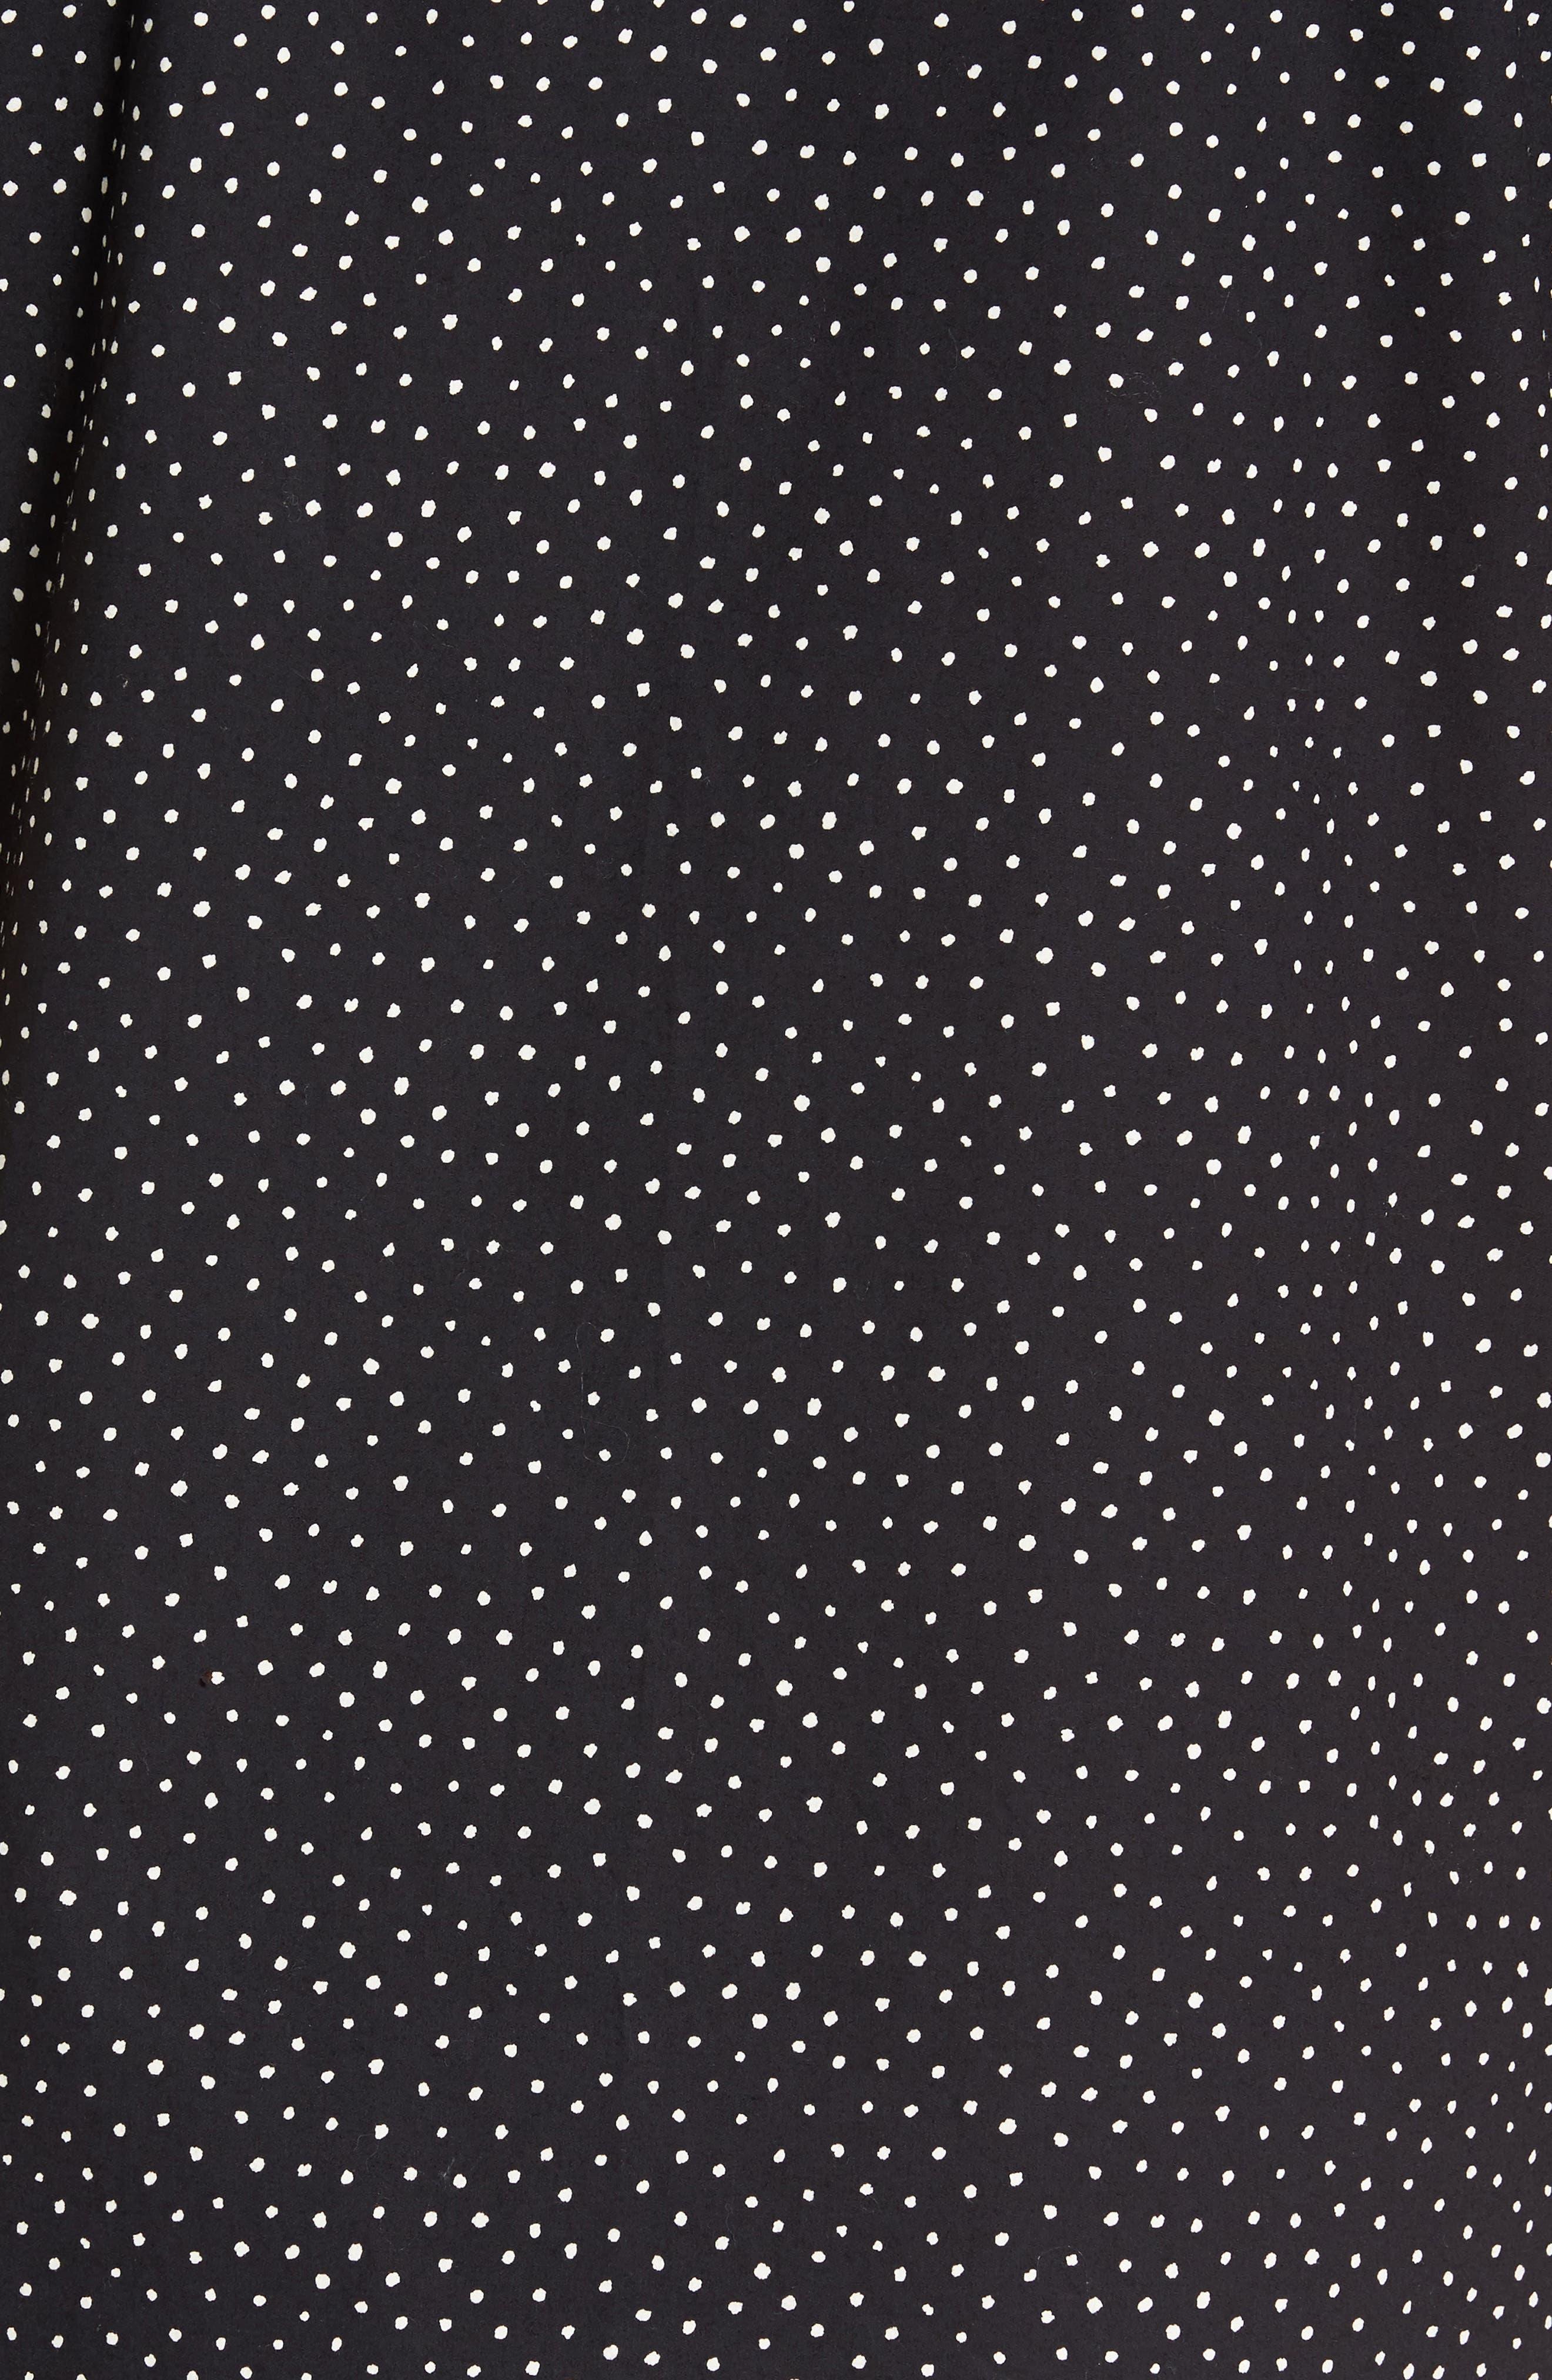 Becker Dot Print Woven Shirt,                             Alternate thumbnail 9, color,